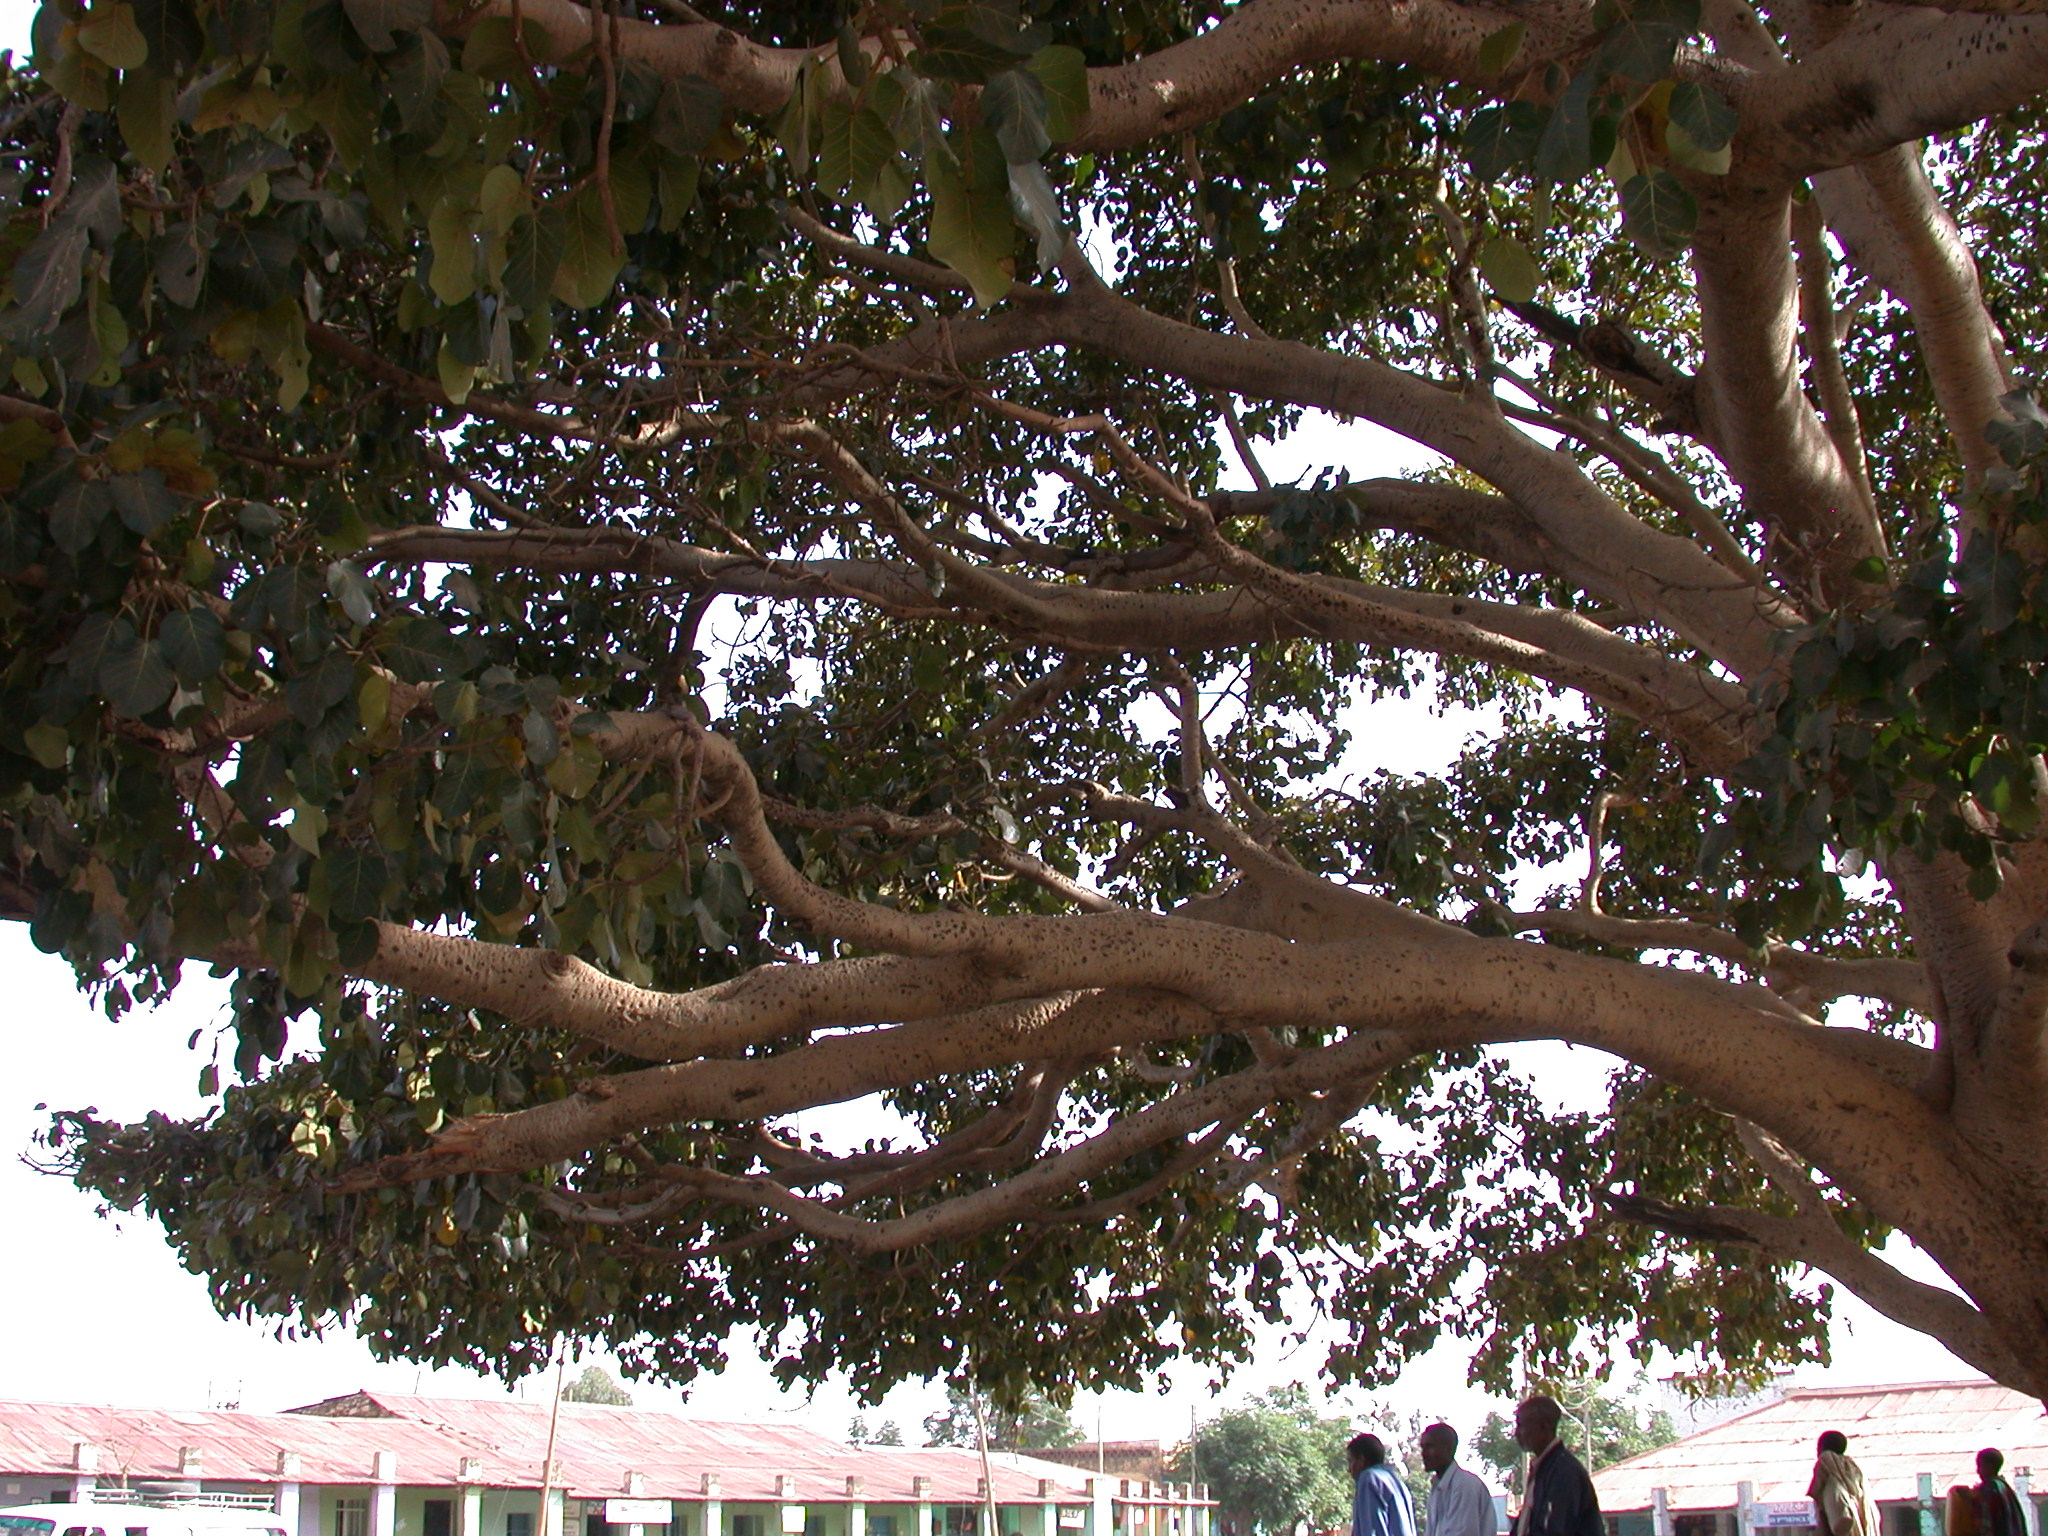 Sycamore Fig, Axum, Tigrai, Ethiopia